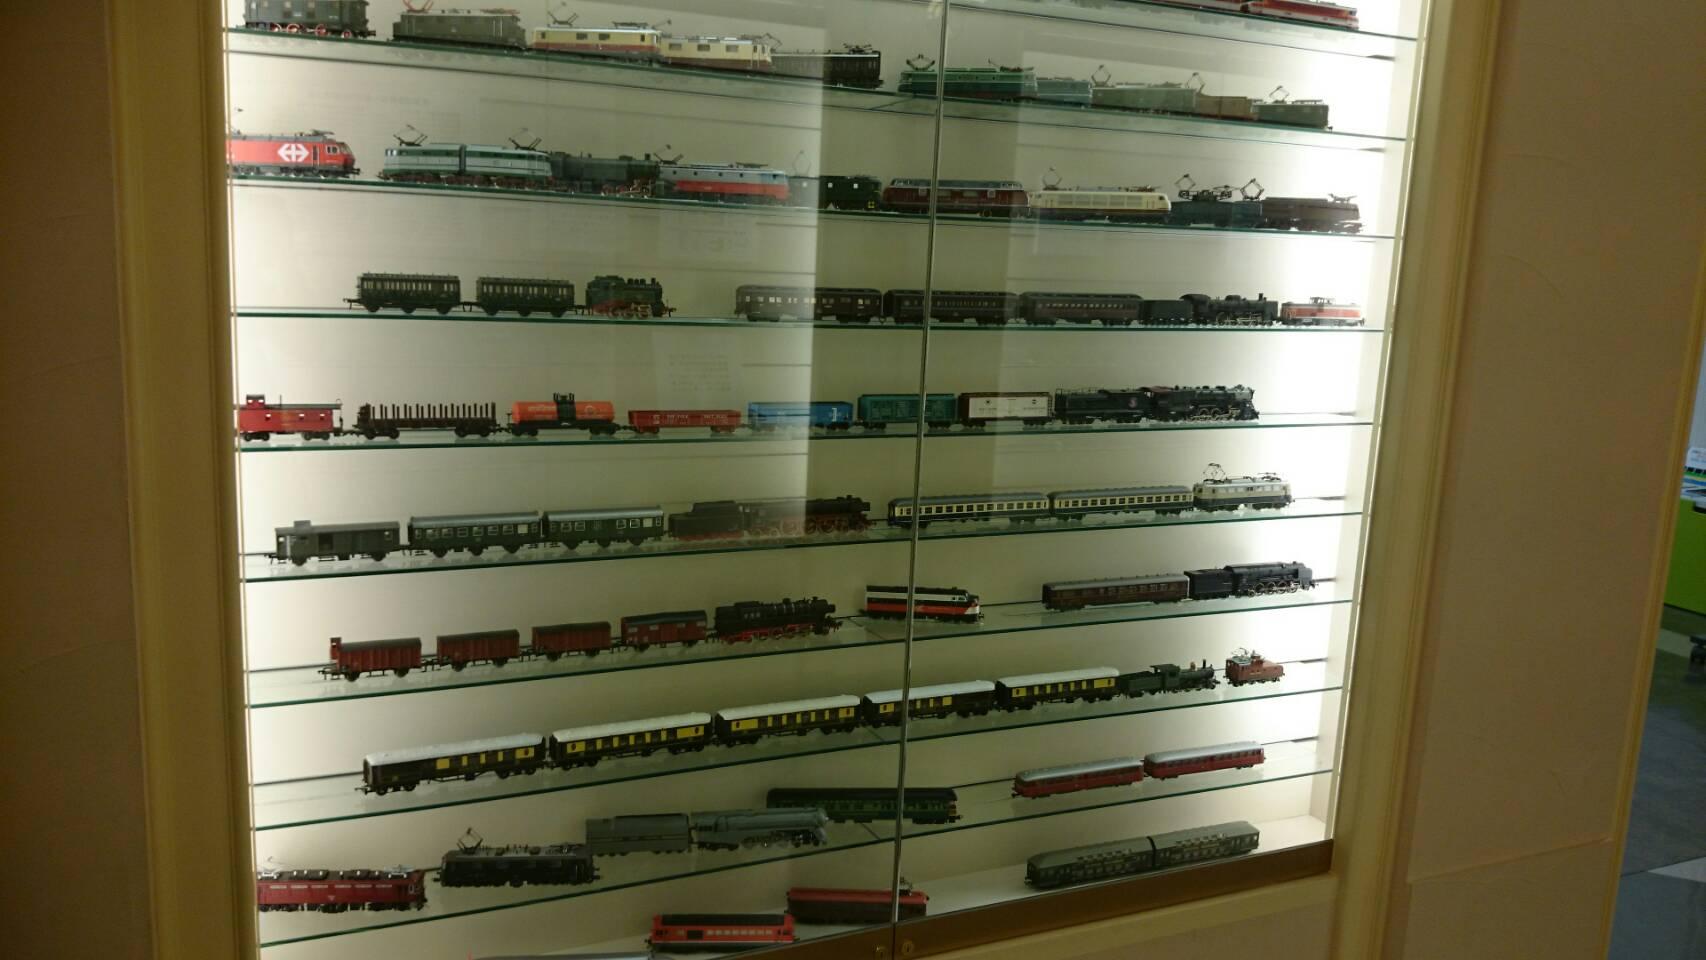 原鉄道博物館機関車Nゲージ展示